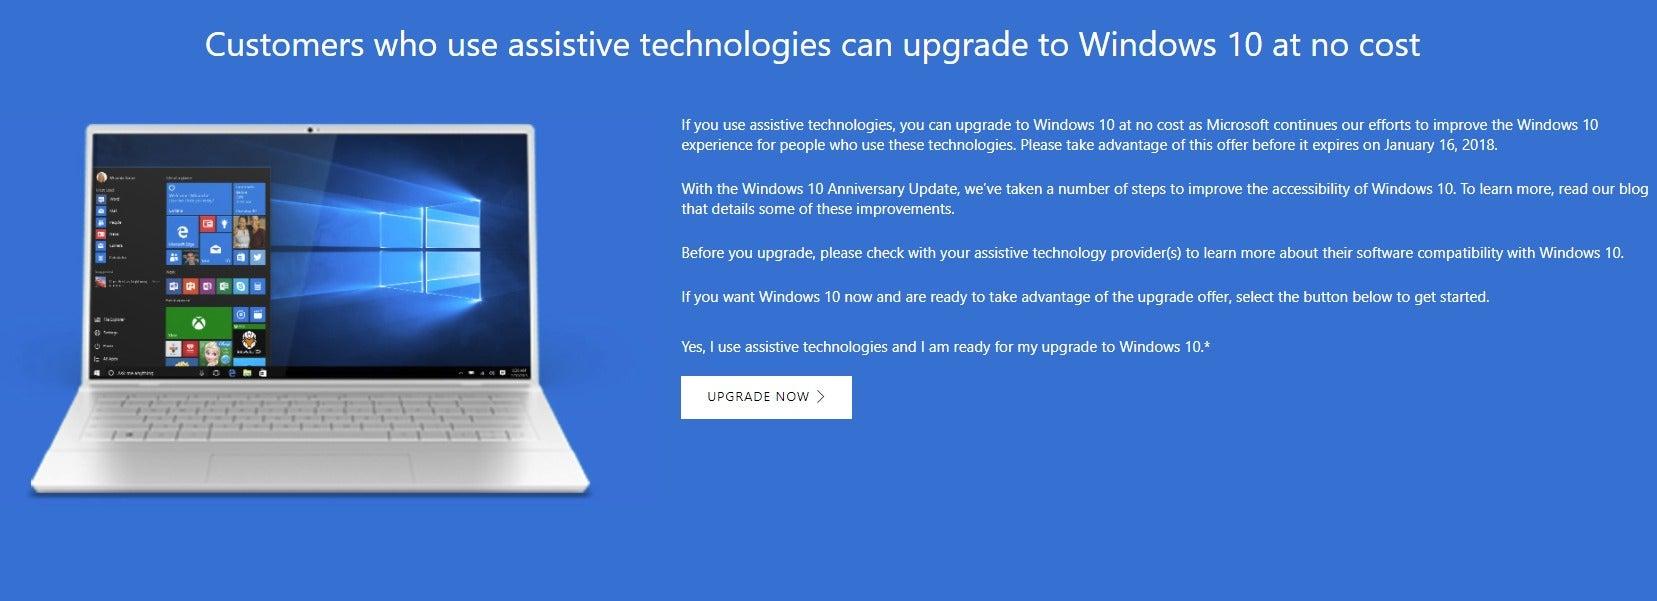 windows 8 1 to windows 10